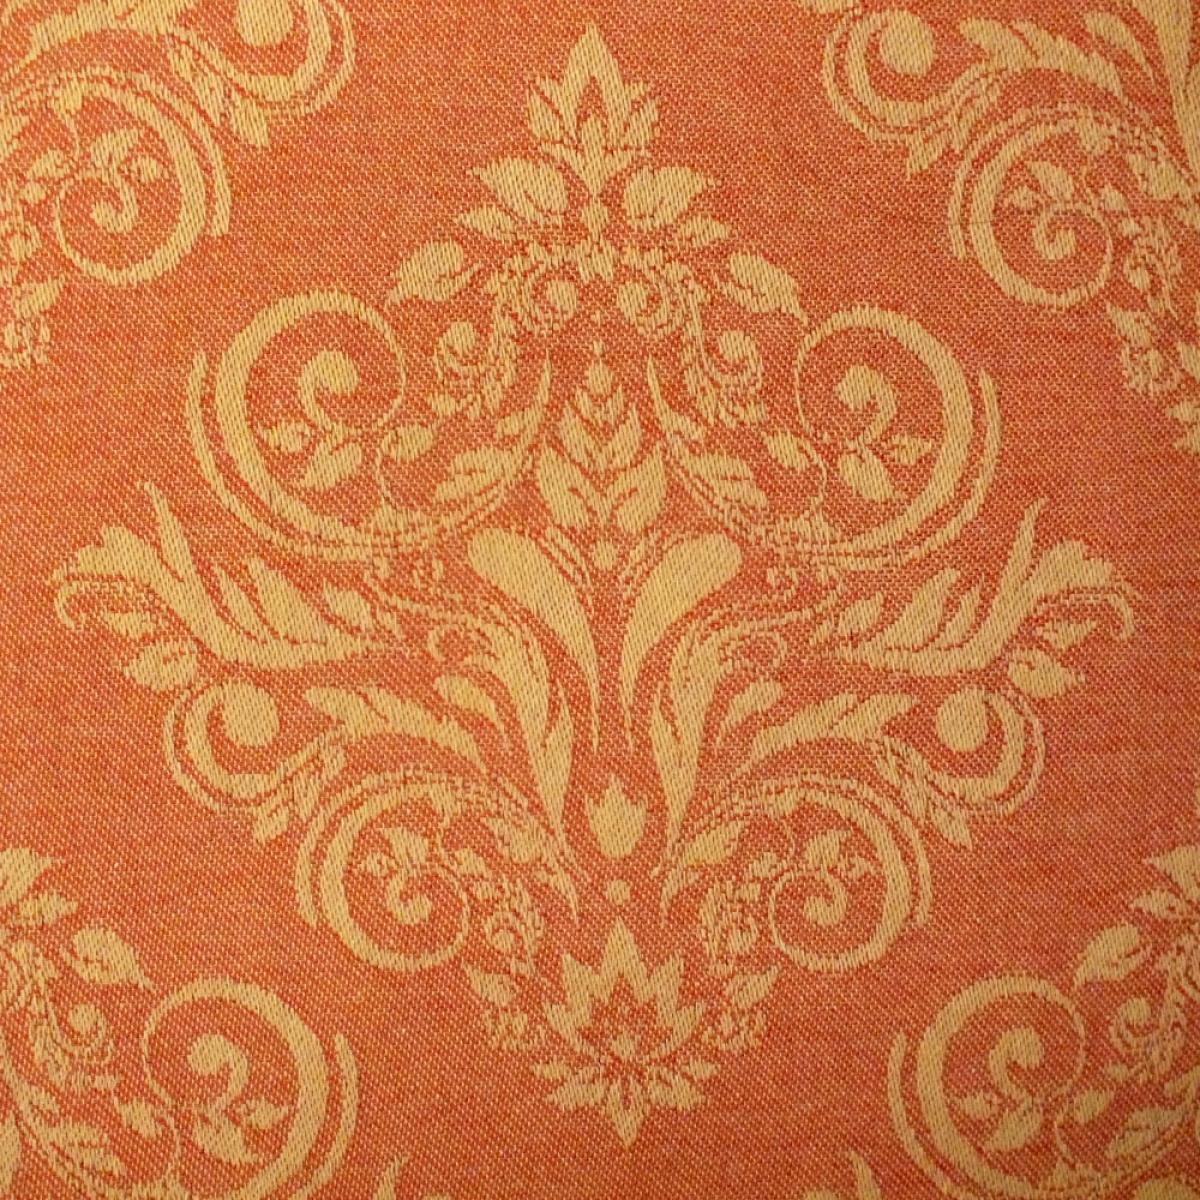 tischdecke jacquard orange fuschia 160x160cm 100 baumwolle. Black Bedroom Furniture Sets. Home Design Ideas